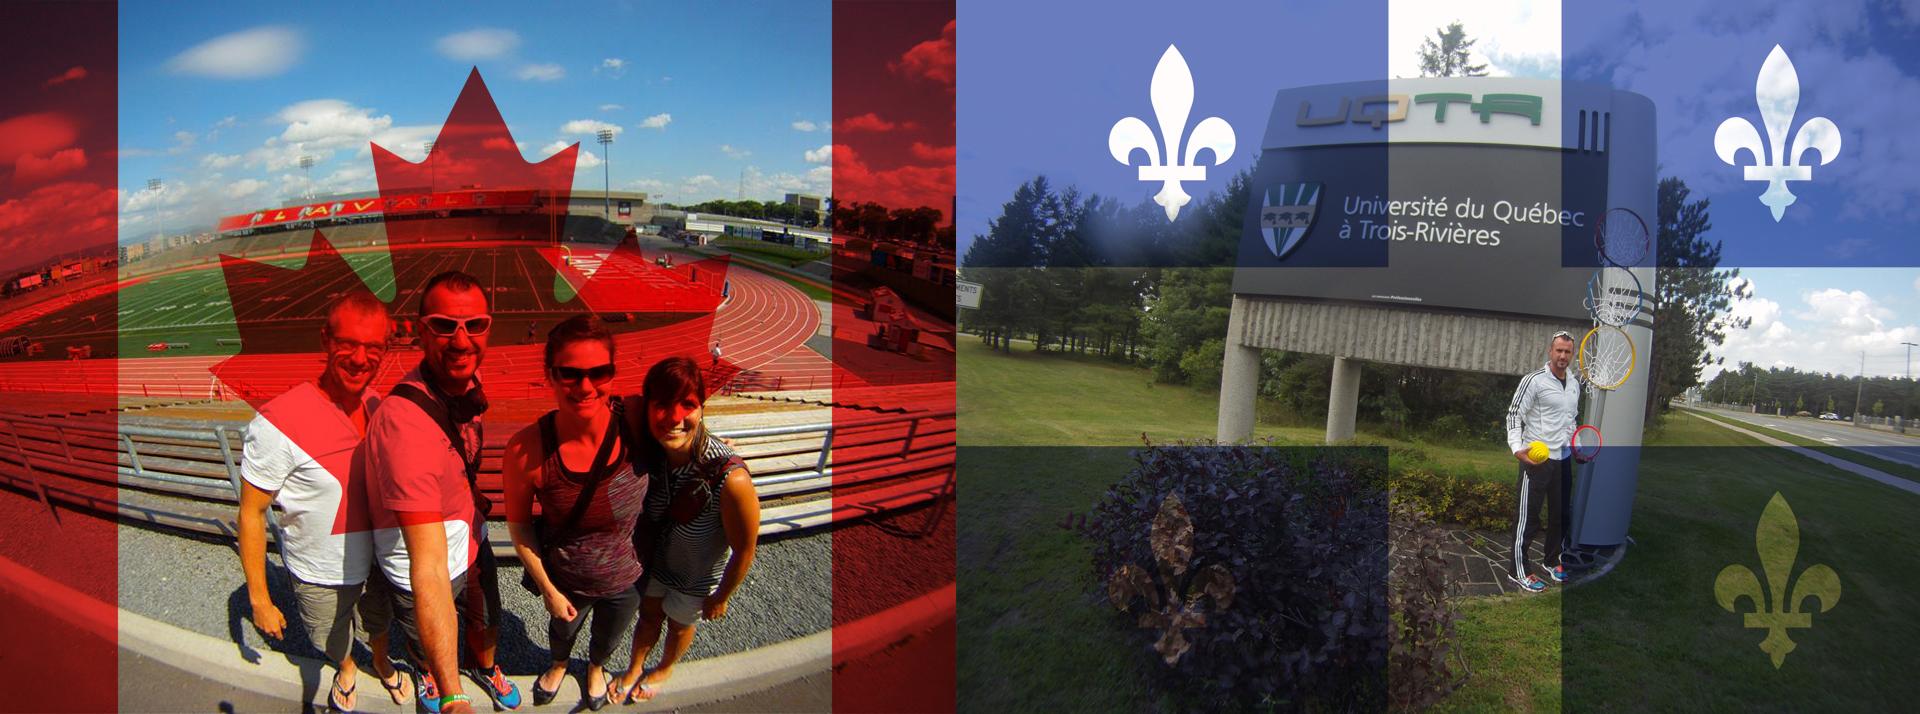 LE CARDIOGOAL S'EXPORTE AU CANADA, QUEBEC